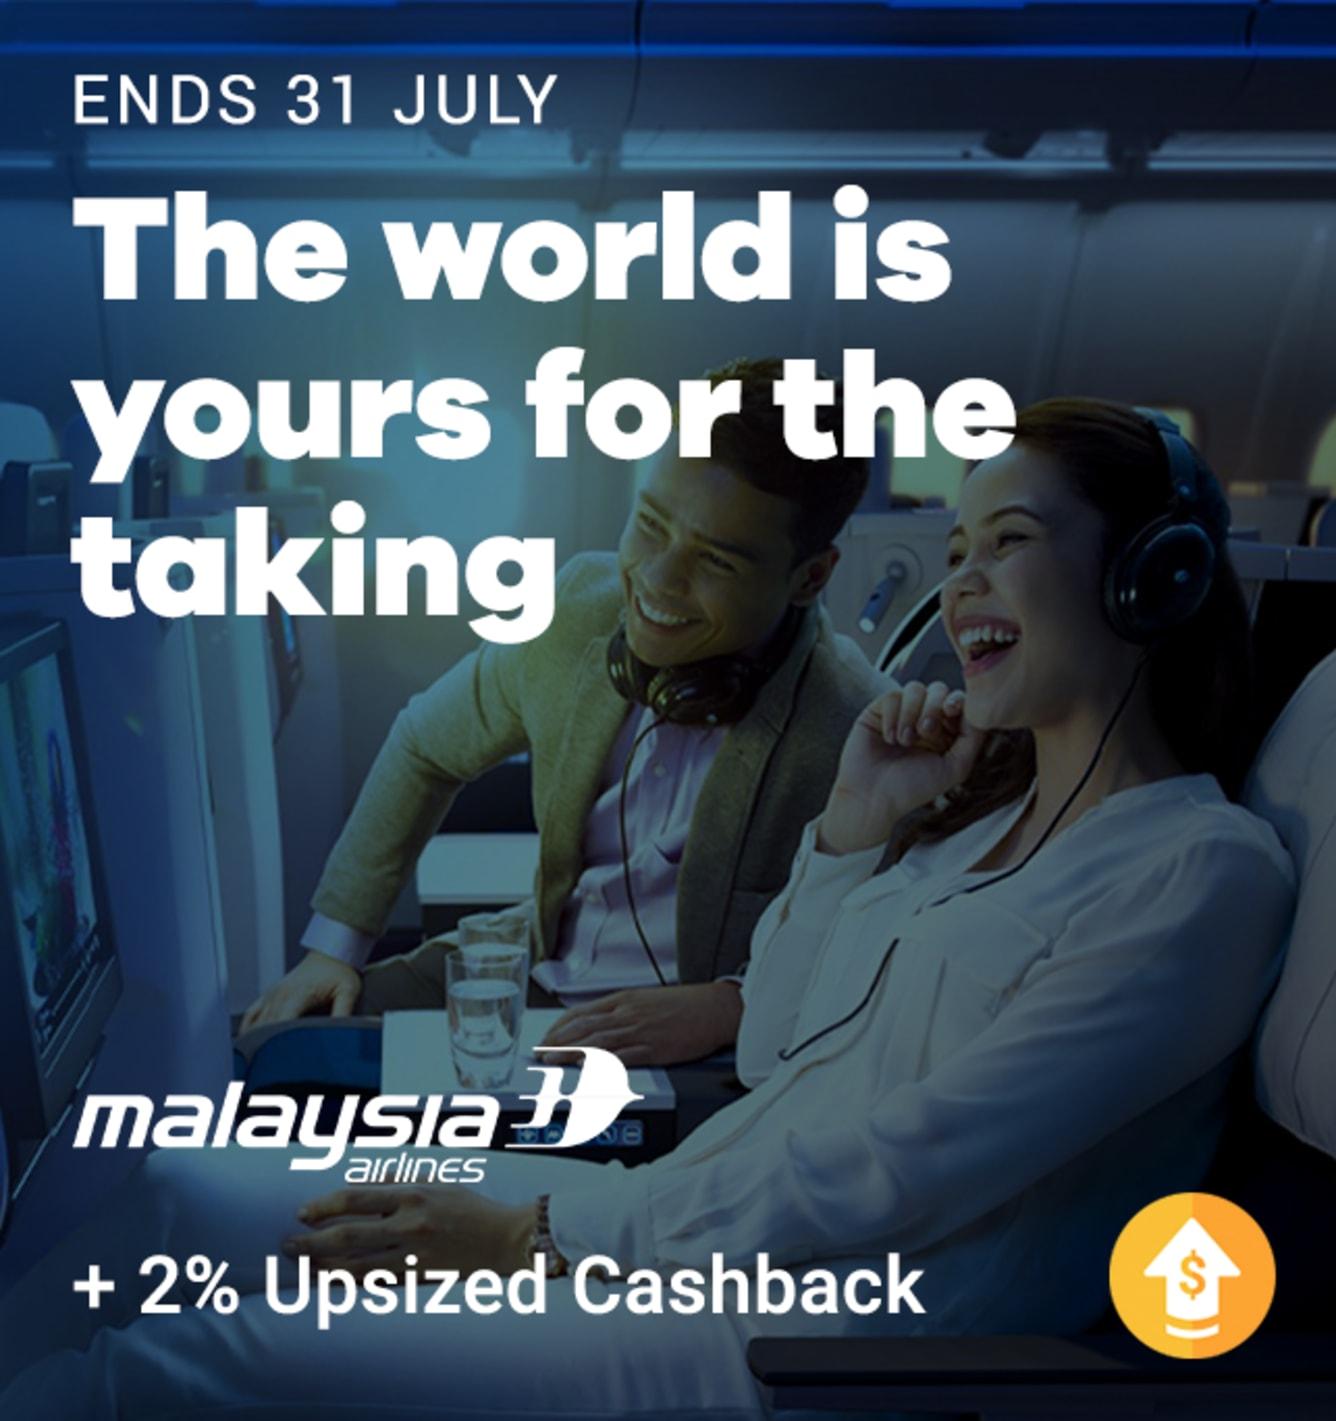 Malaysia Airlines 2% Upsized Cashback